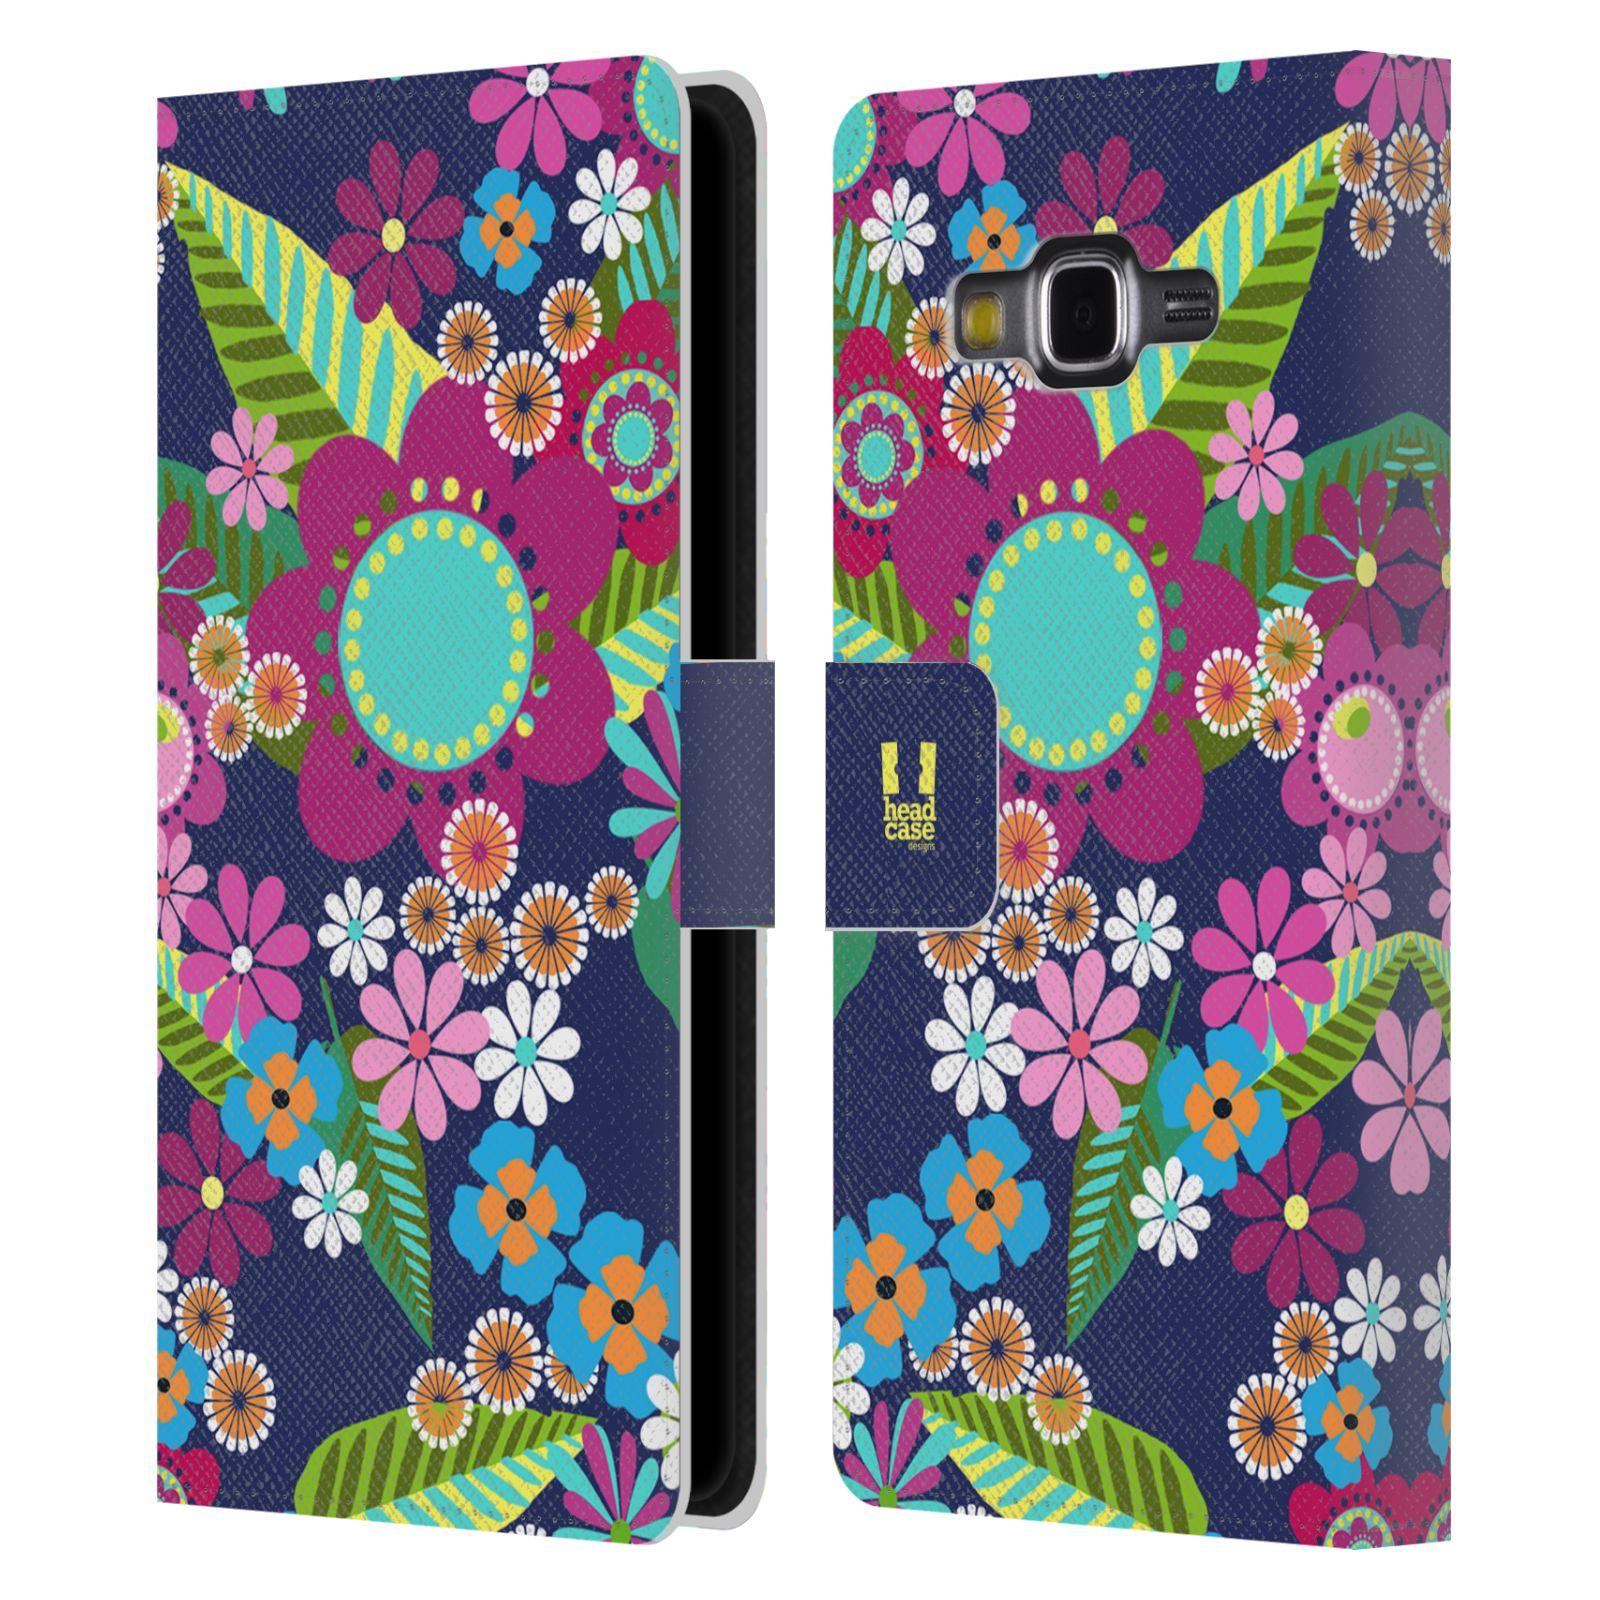 HEAD CASE Flipové pouzdro pro mobil Samsung Galaxy Grand PRIME BOTANIKA barevné květy modrá